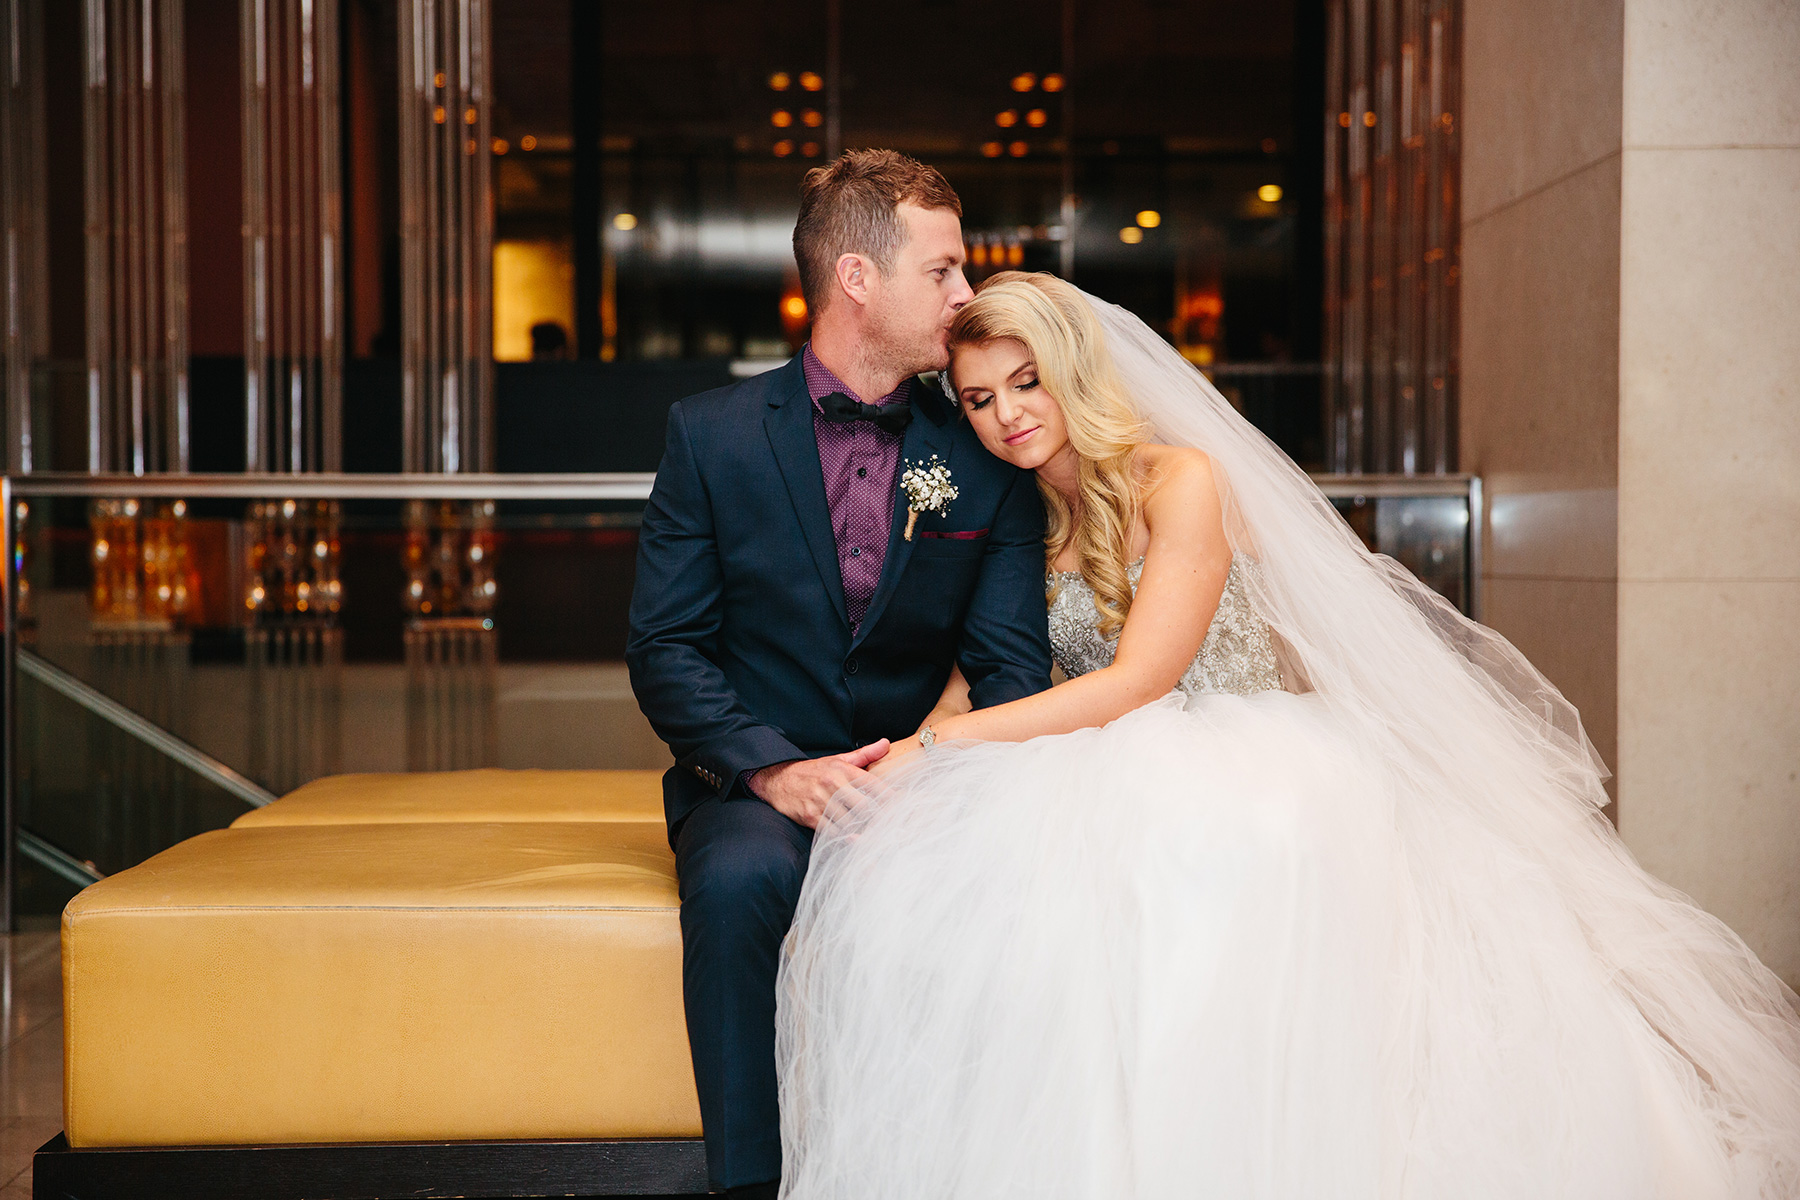 Melody_Matt_Winter-Wedding_031